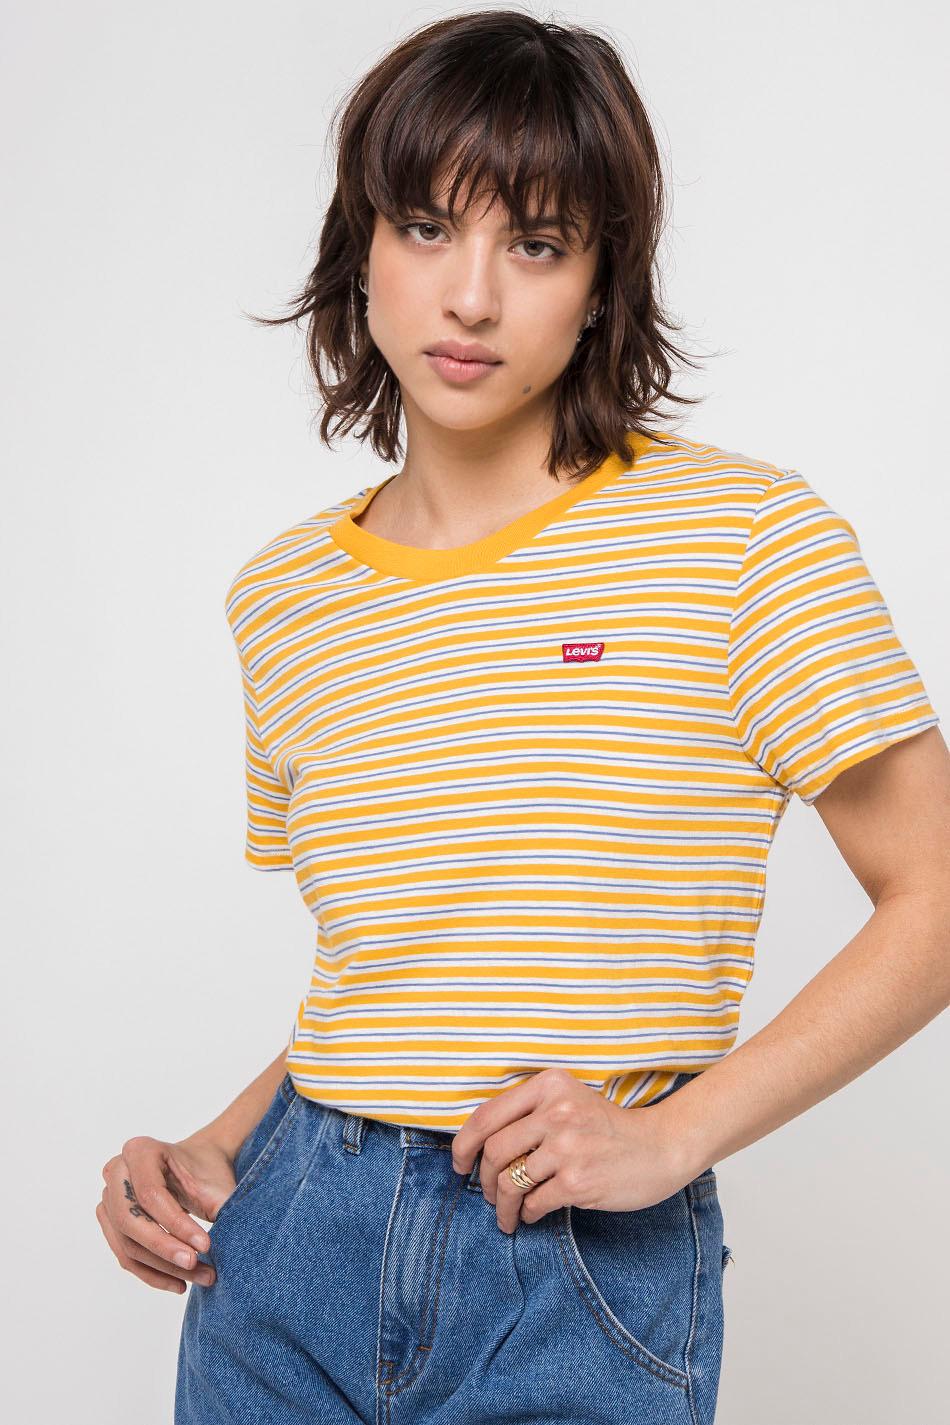 Camiseta Levi's Moonstone Gold Coast